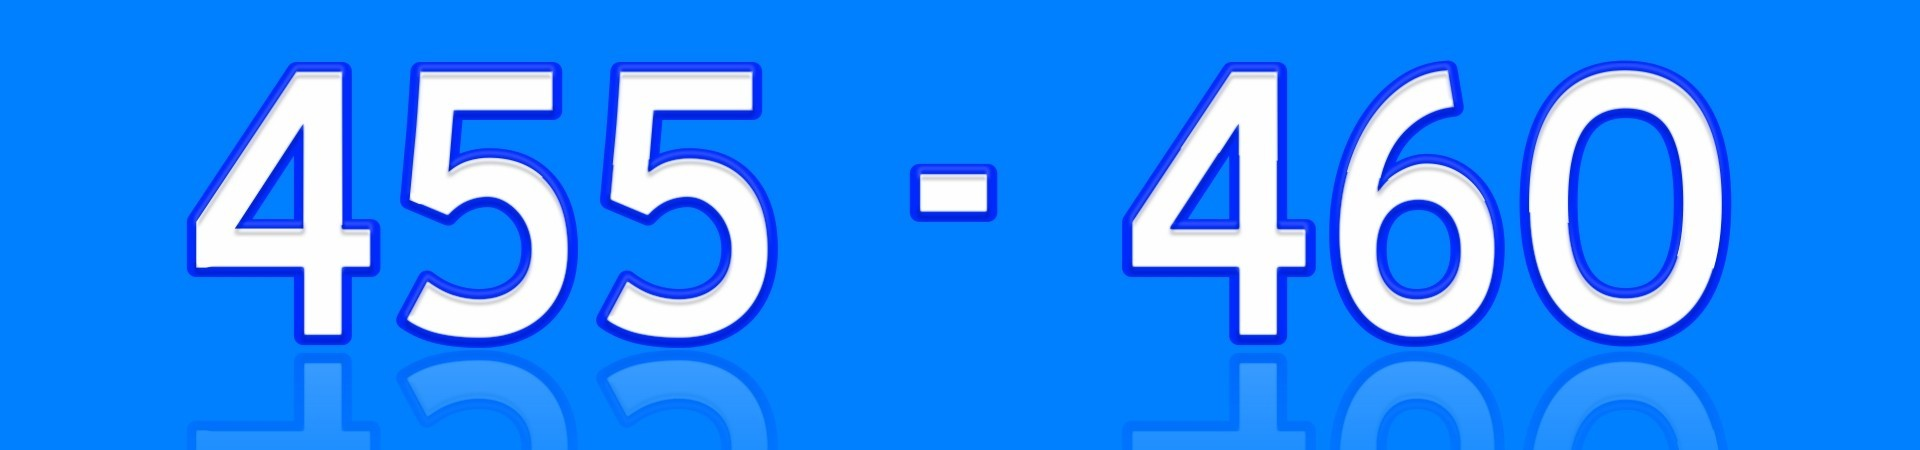 REPUESTOS para Motosierra HUSQVARNA 455 460